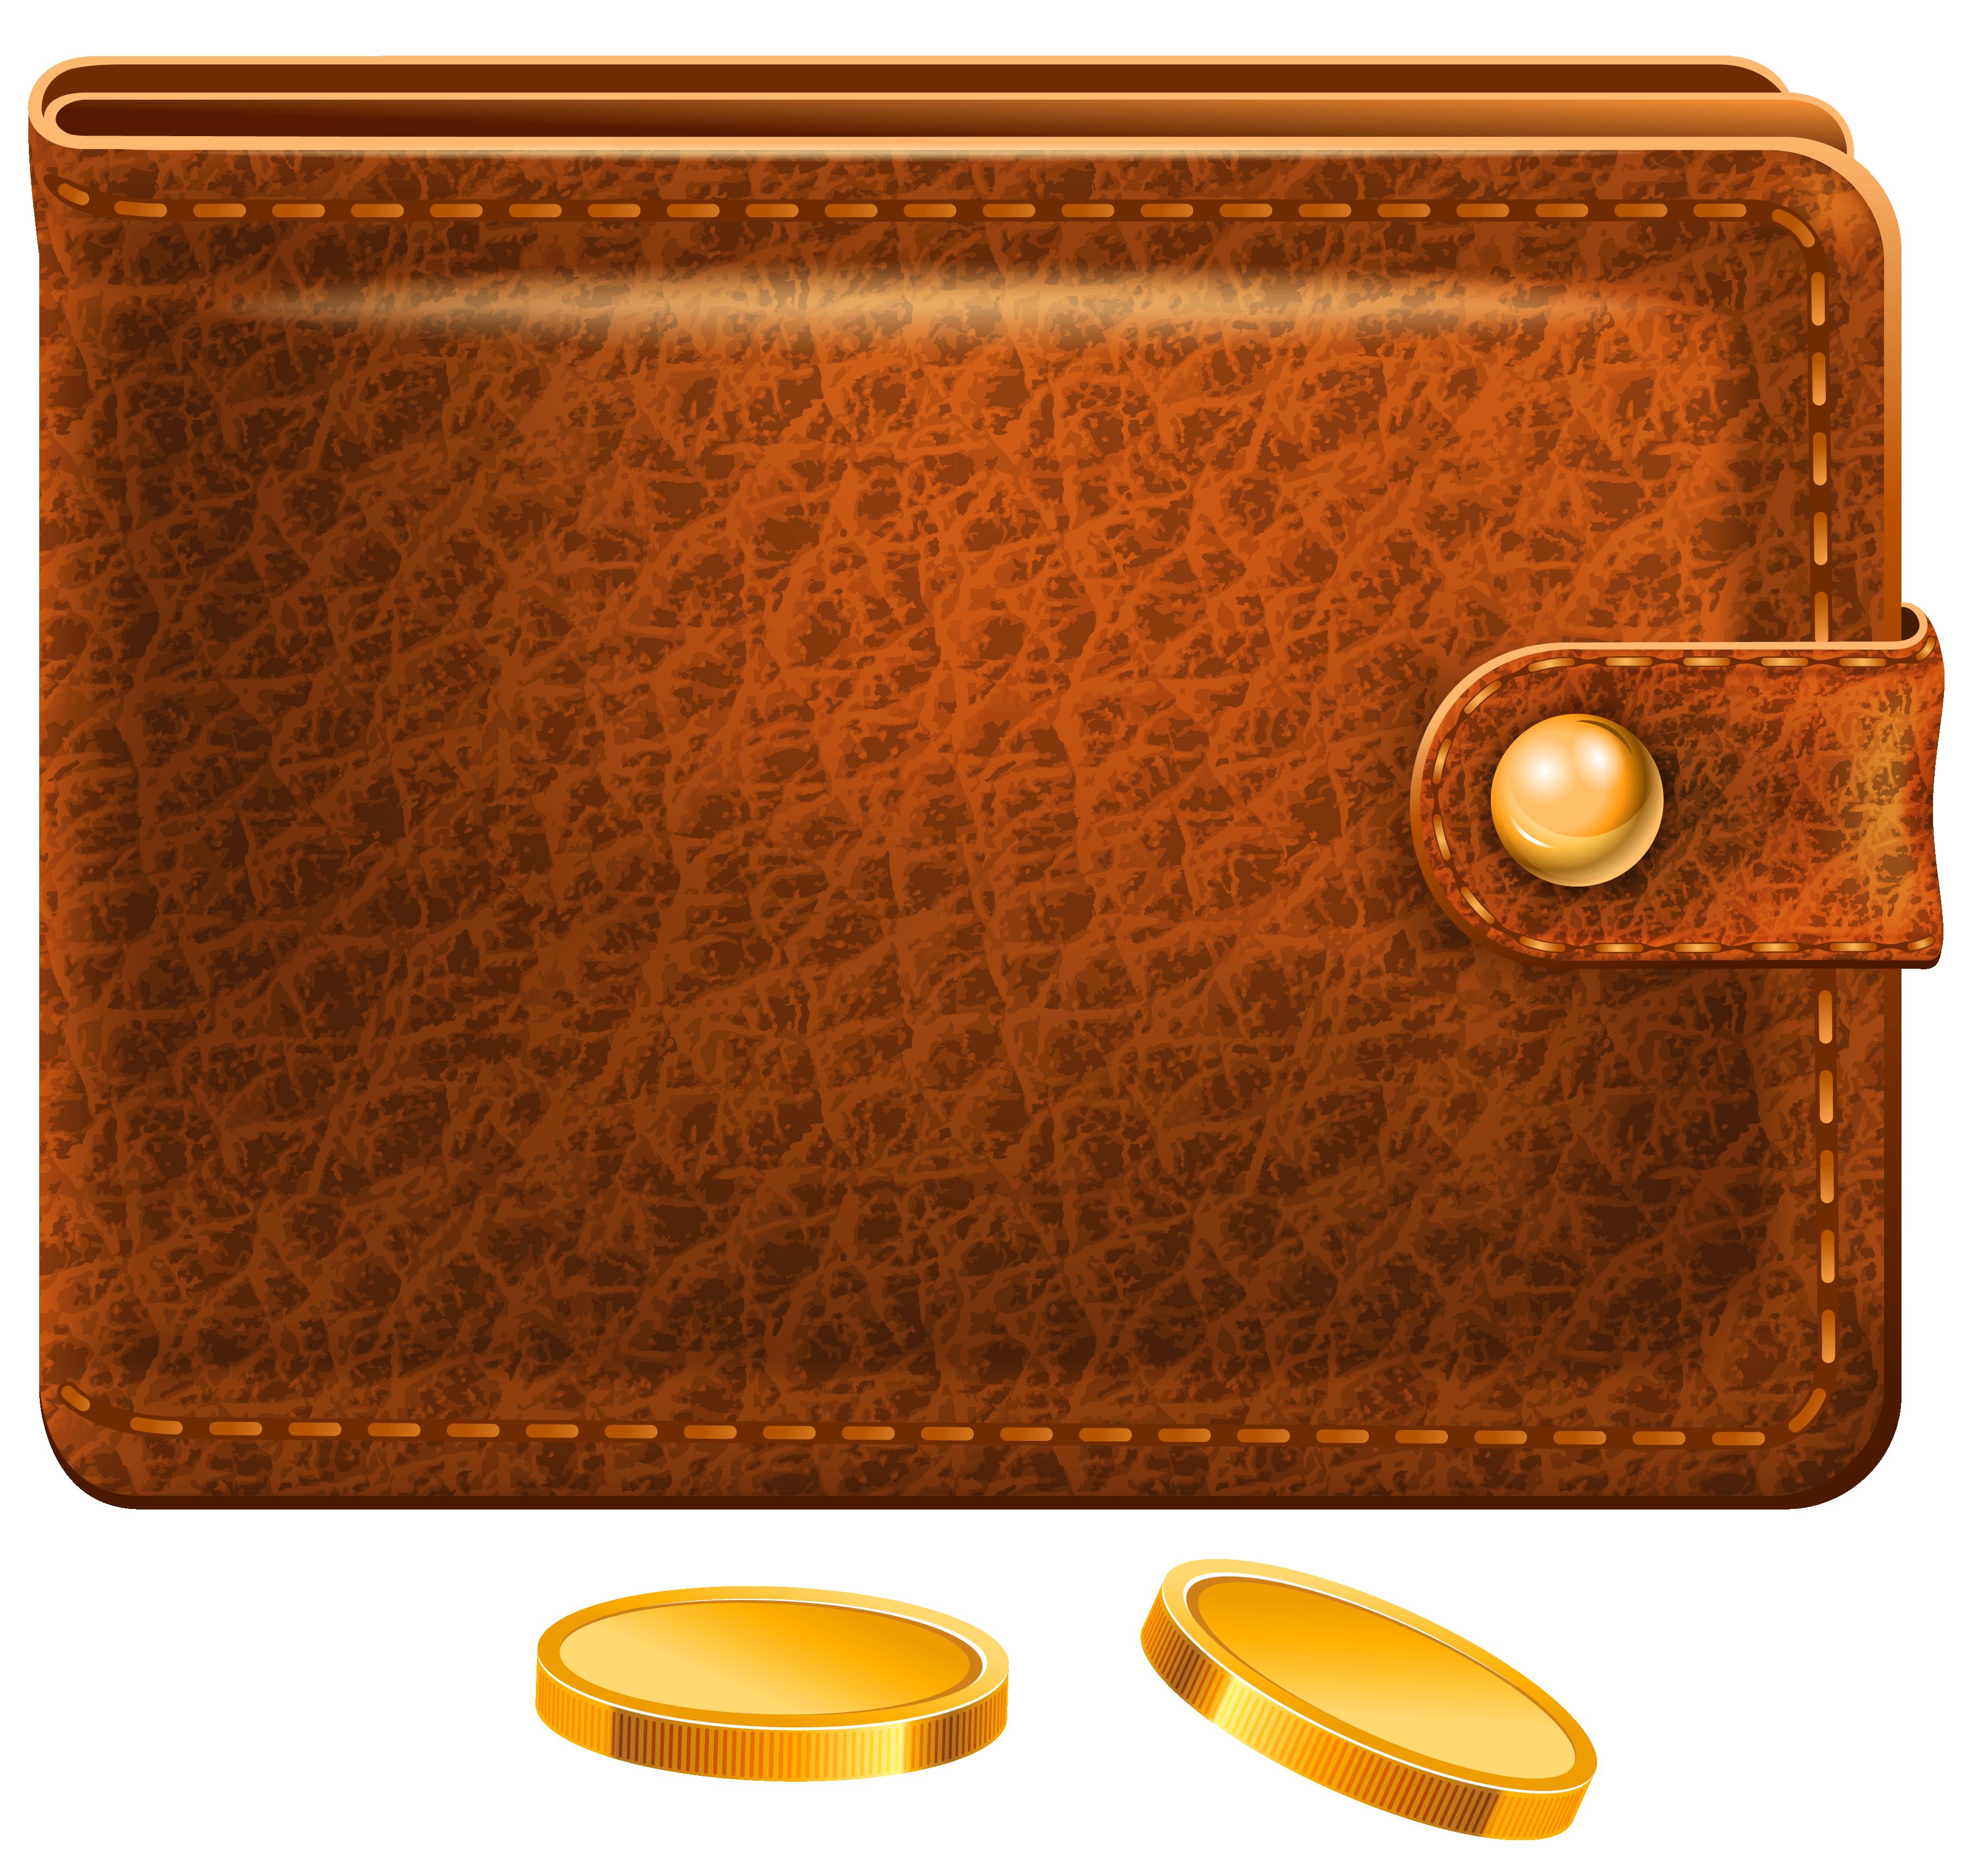 Clip art png transparent. Wallet clipart leather wallet